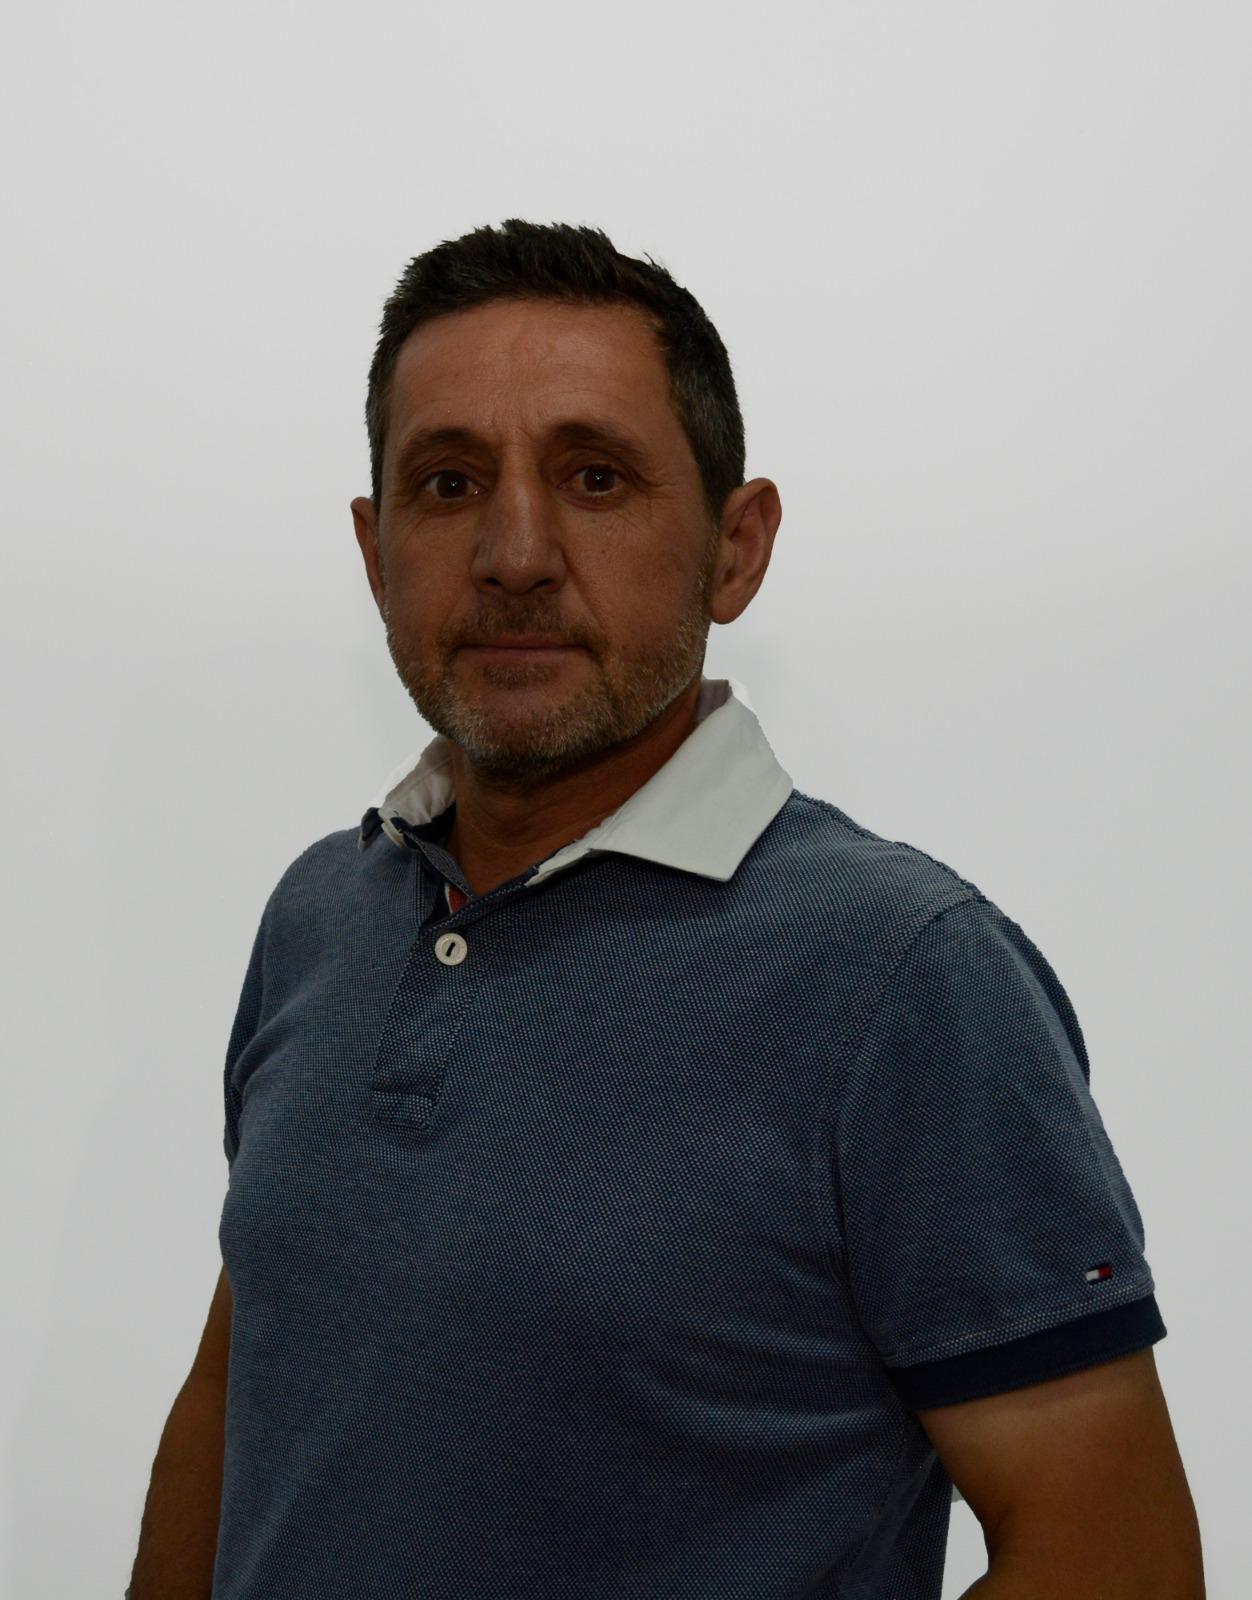 Francisco Pedrosa Nuñez